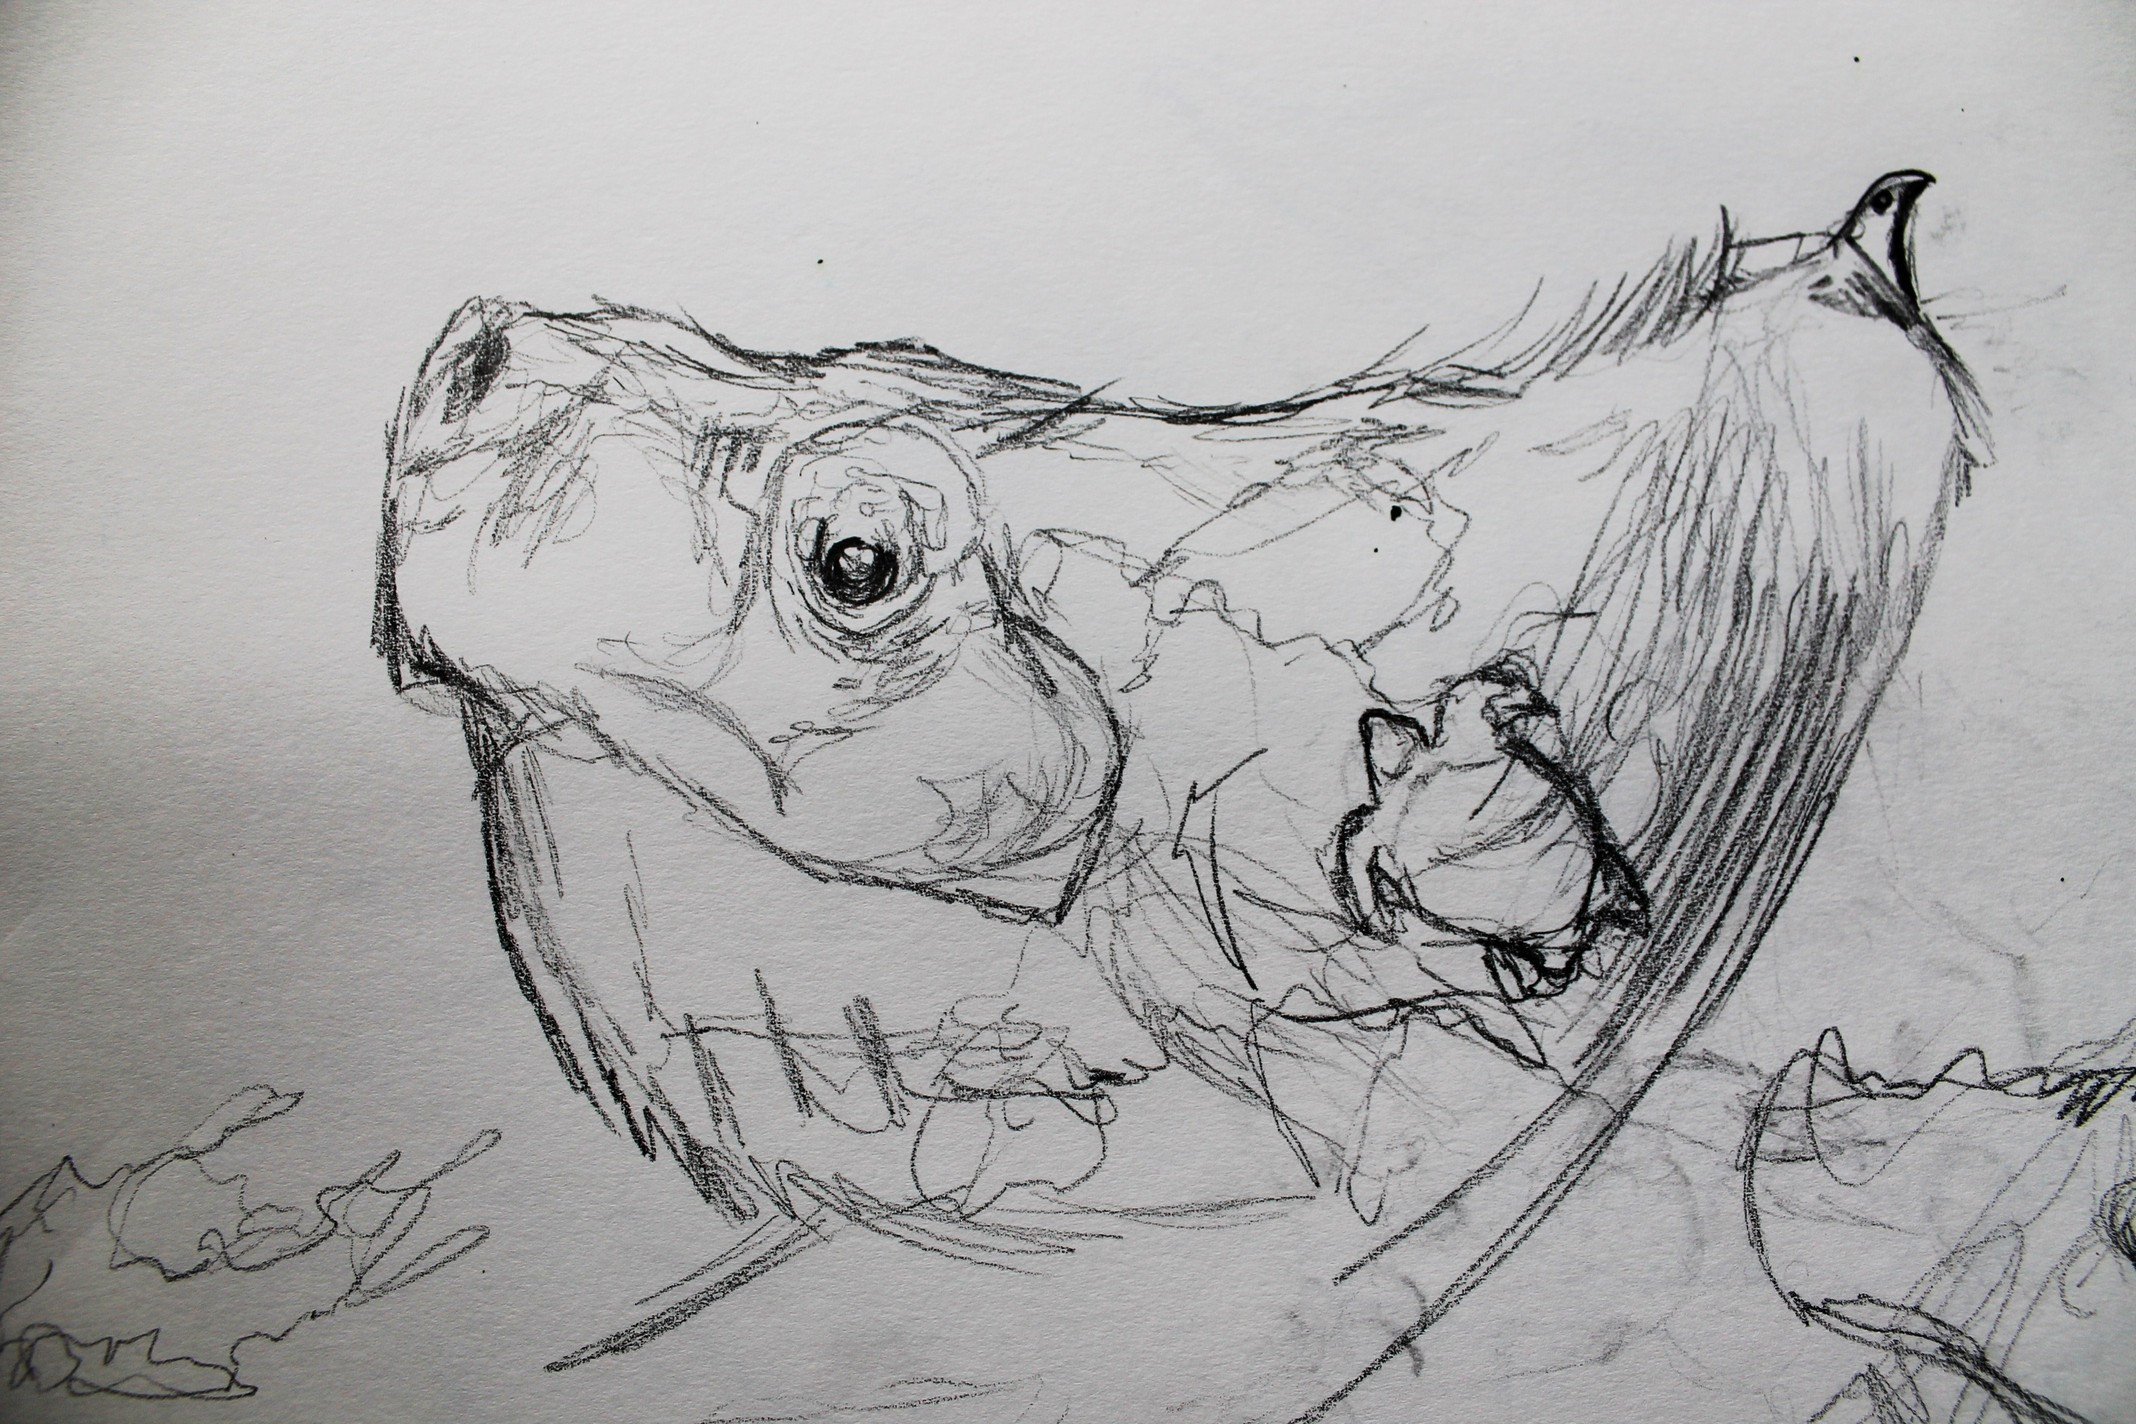 eagle-tortoise-sketch3.jpg.JPG